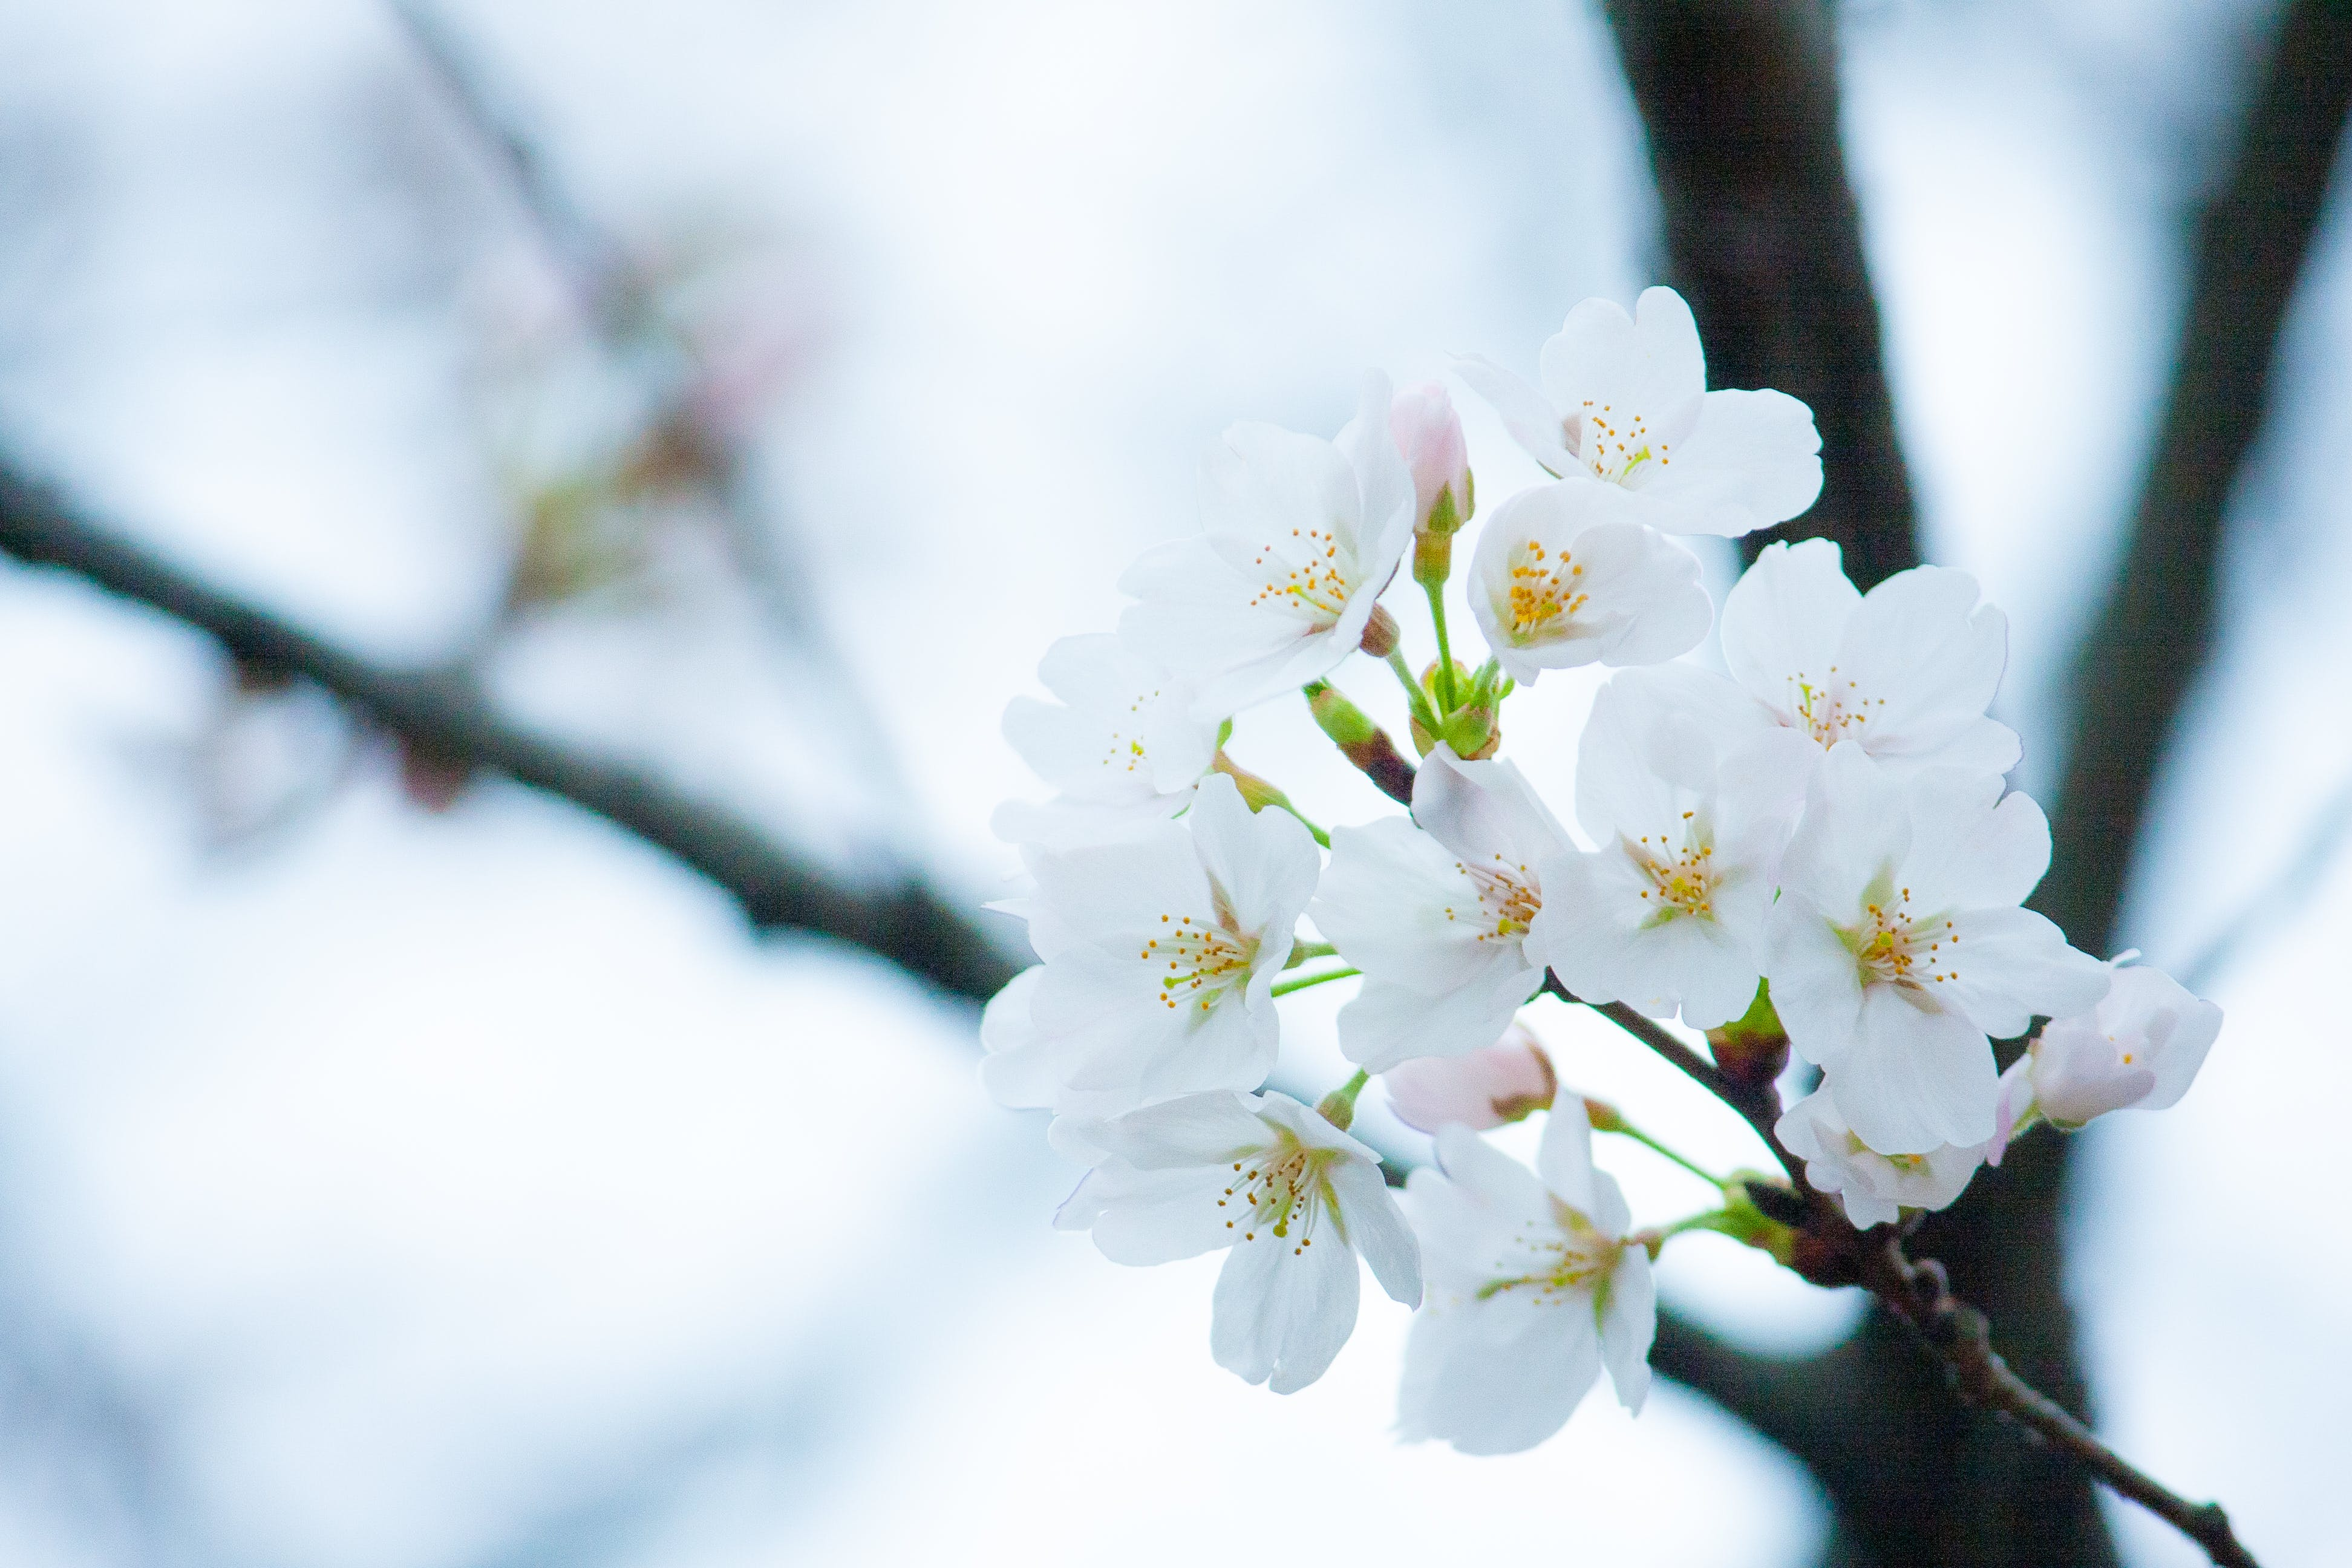 White Blossom Flower Selective Focus Photo